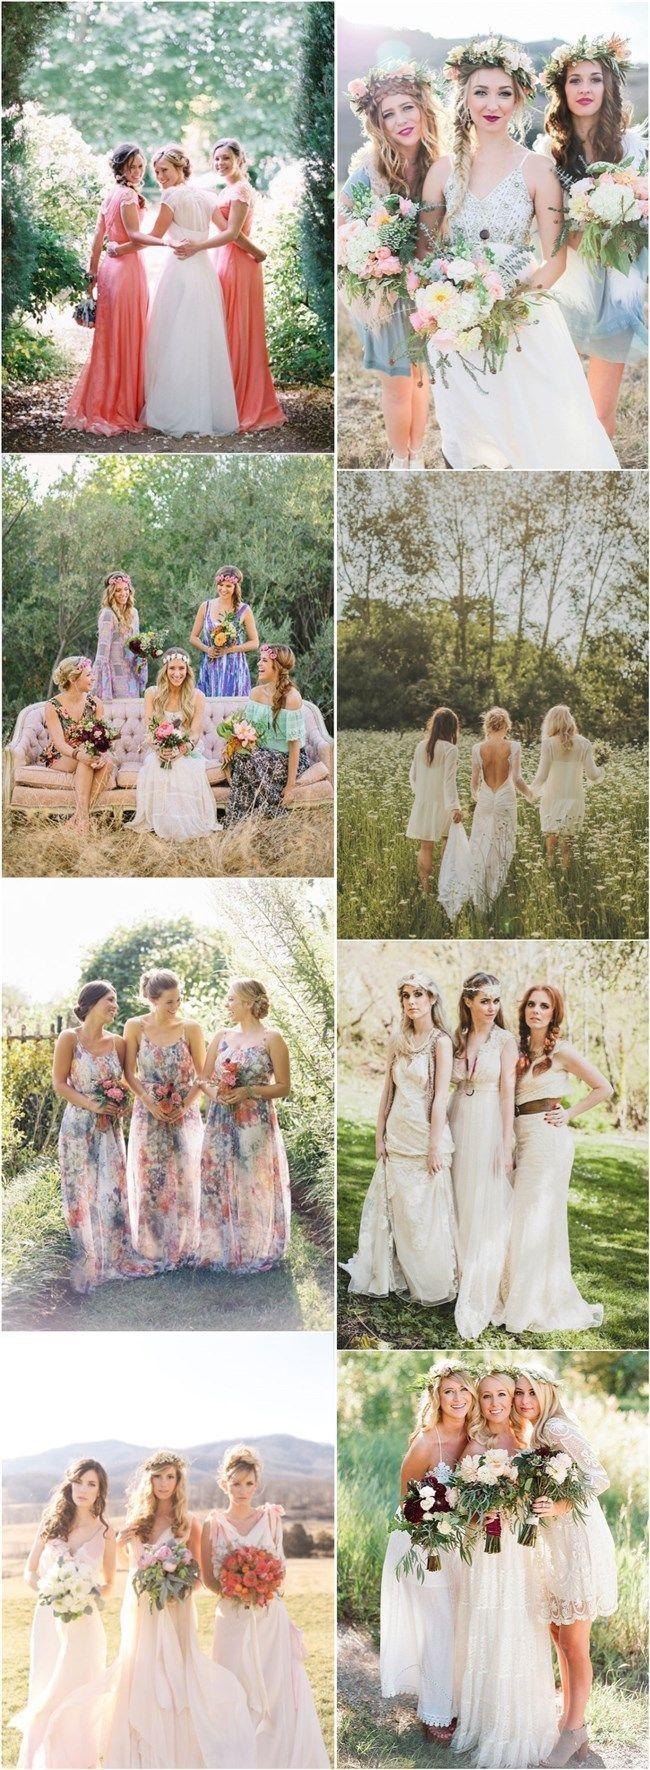 50 chic bohemian bridesmaid dresses ideas bridesmaid. Black Bedroom Furniture Sets. Home Design Ideas